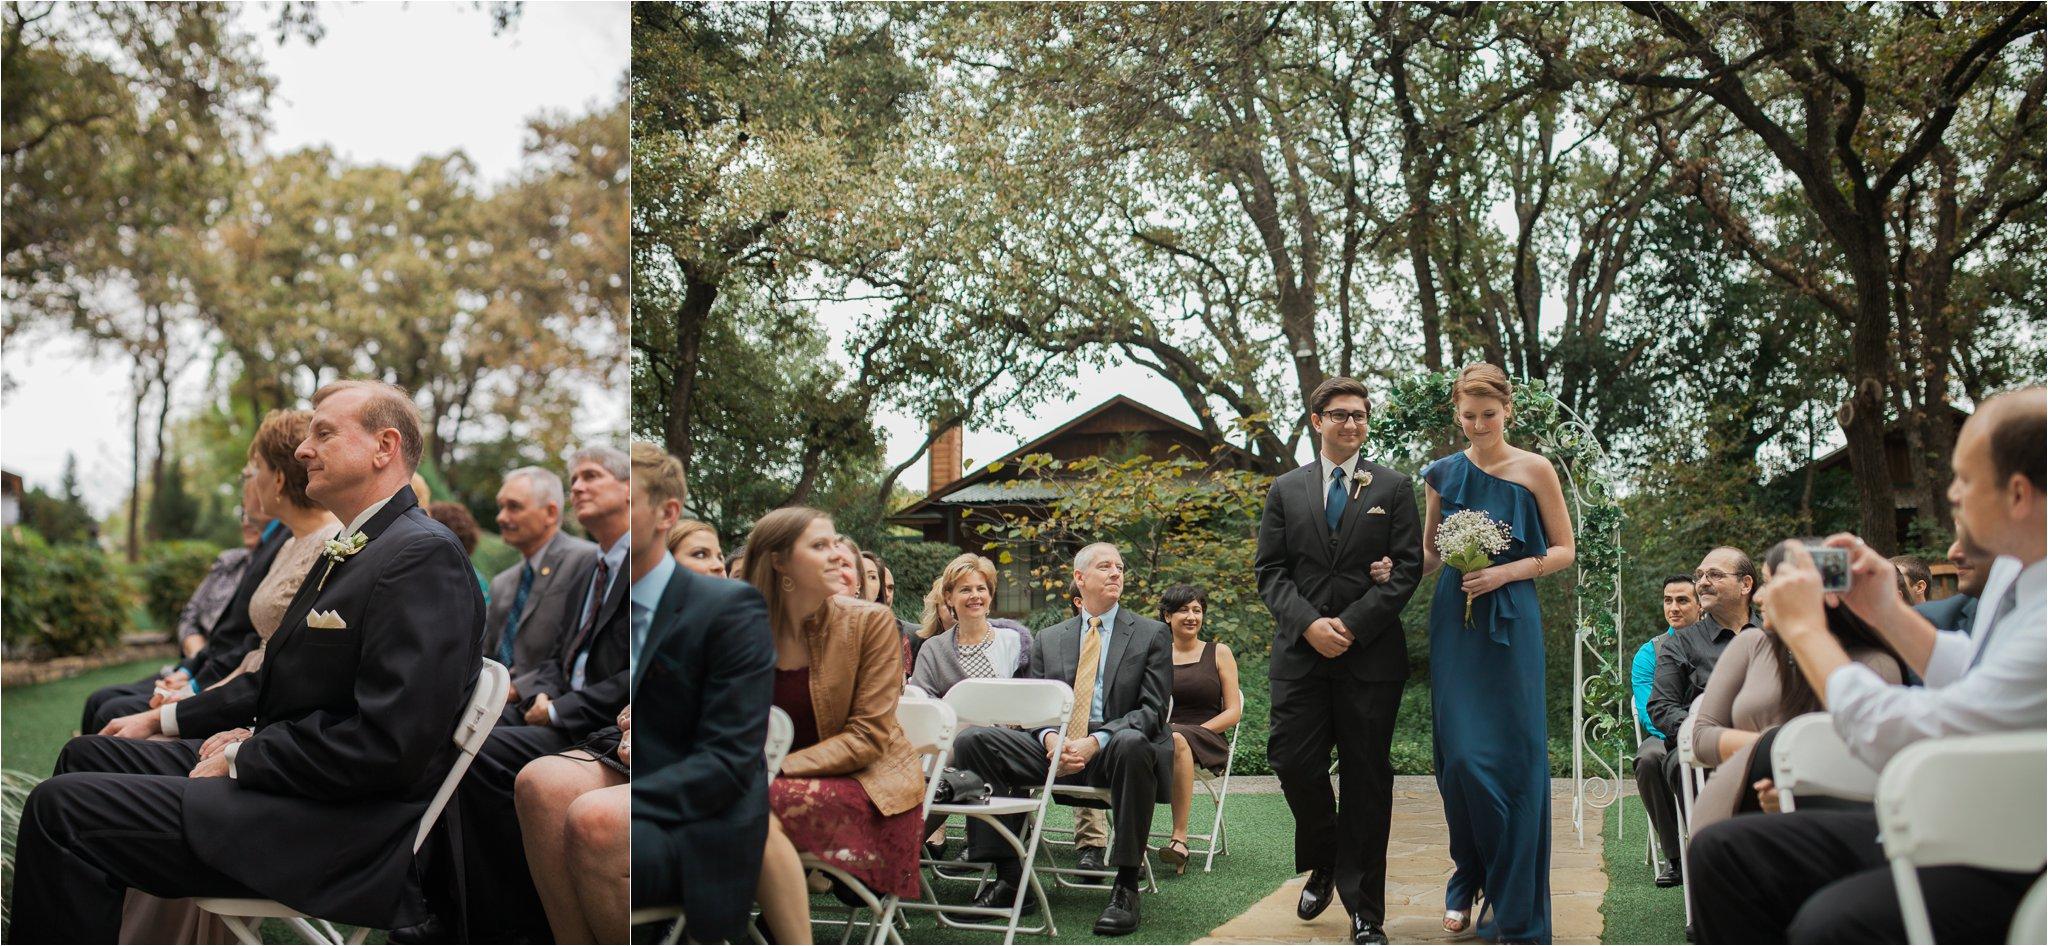 lunsford-wedding-463.jpg